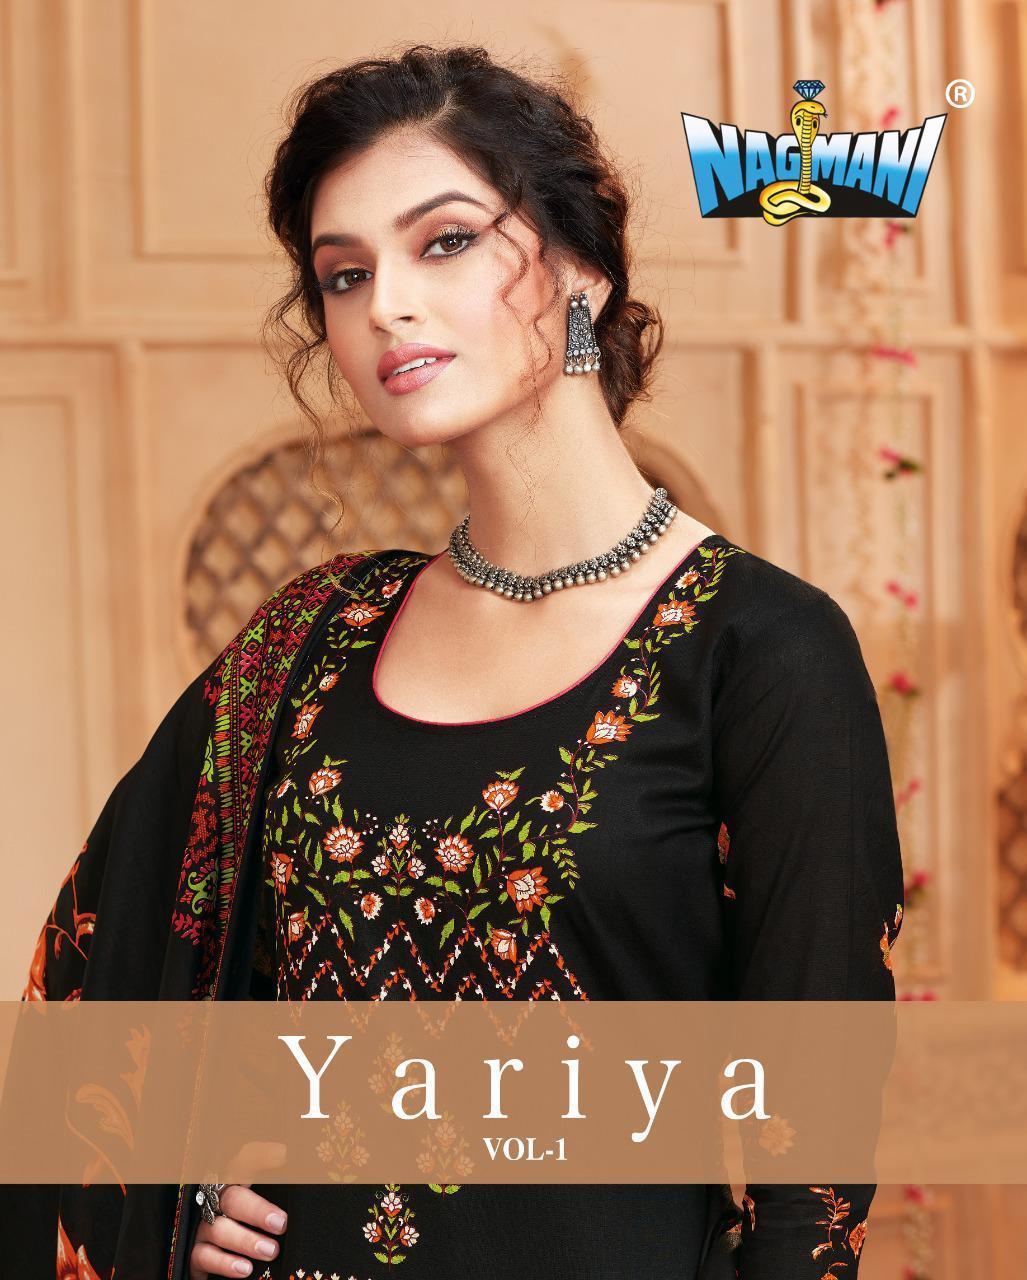 Nagmani-Yariya-Vol-1-1